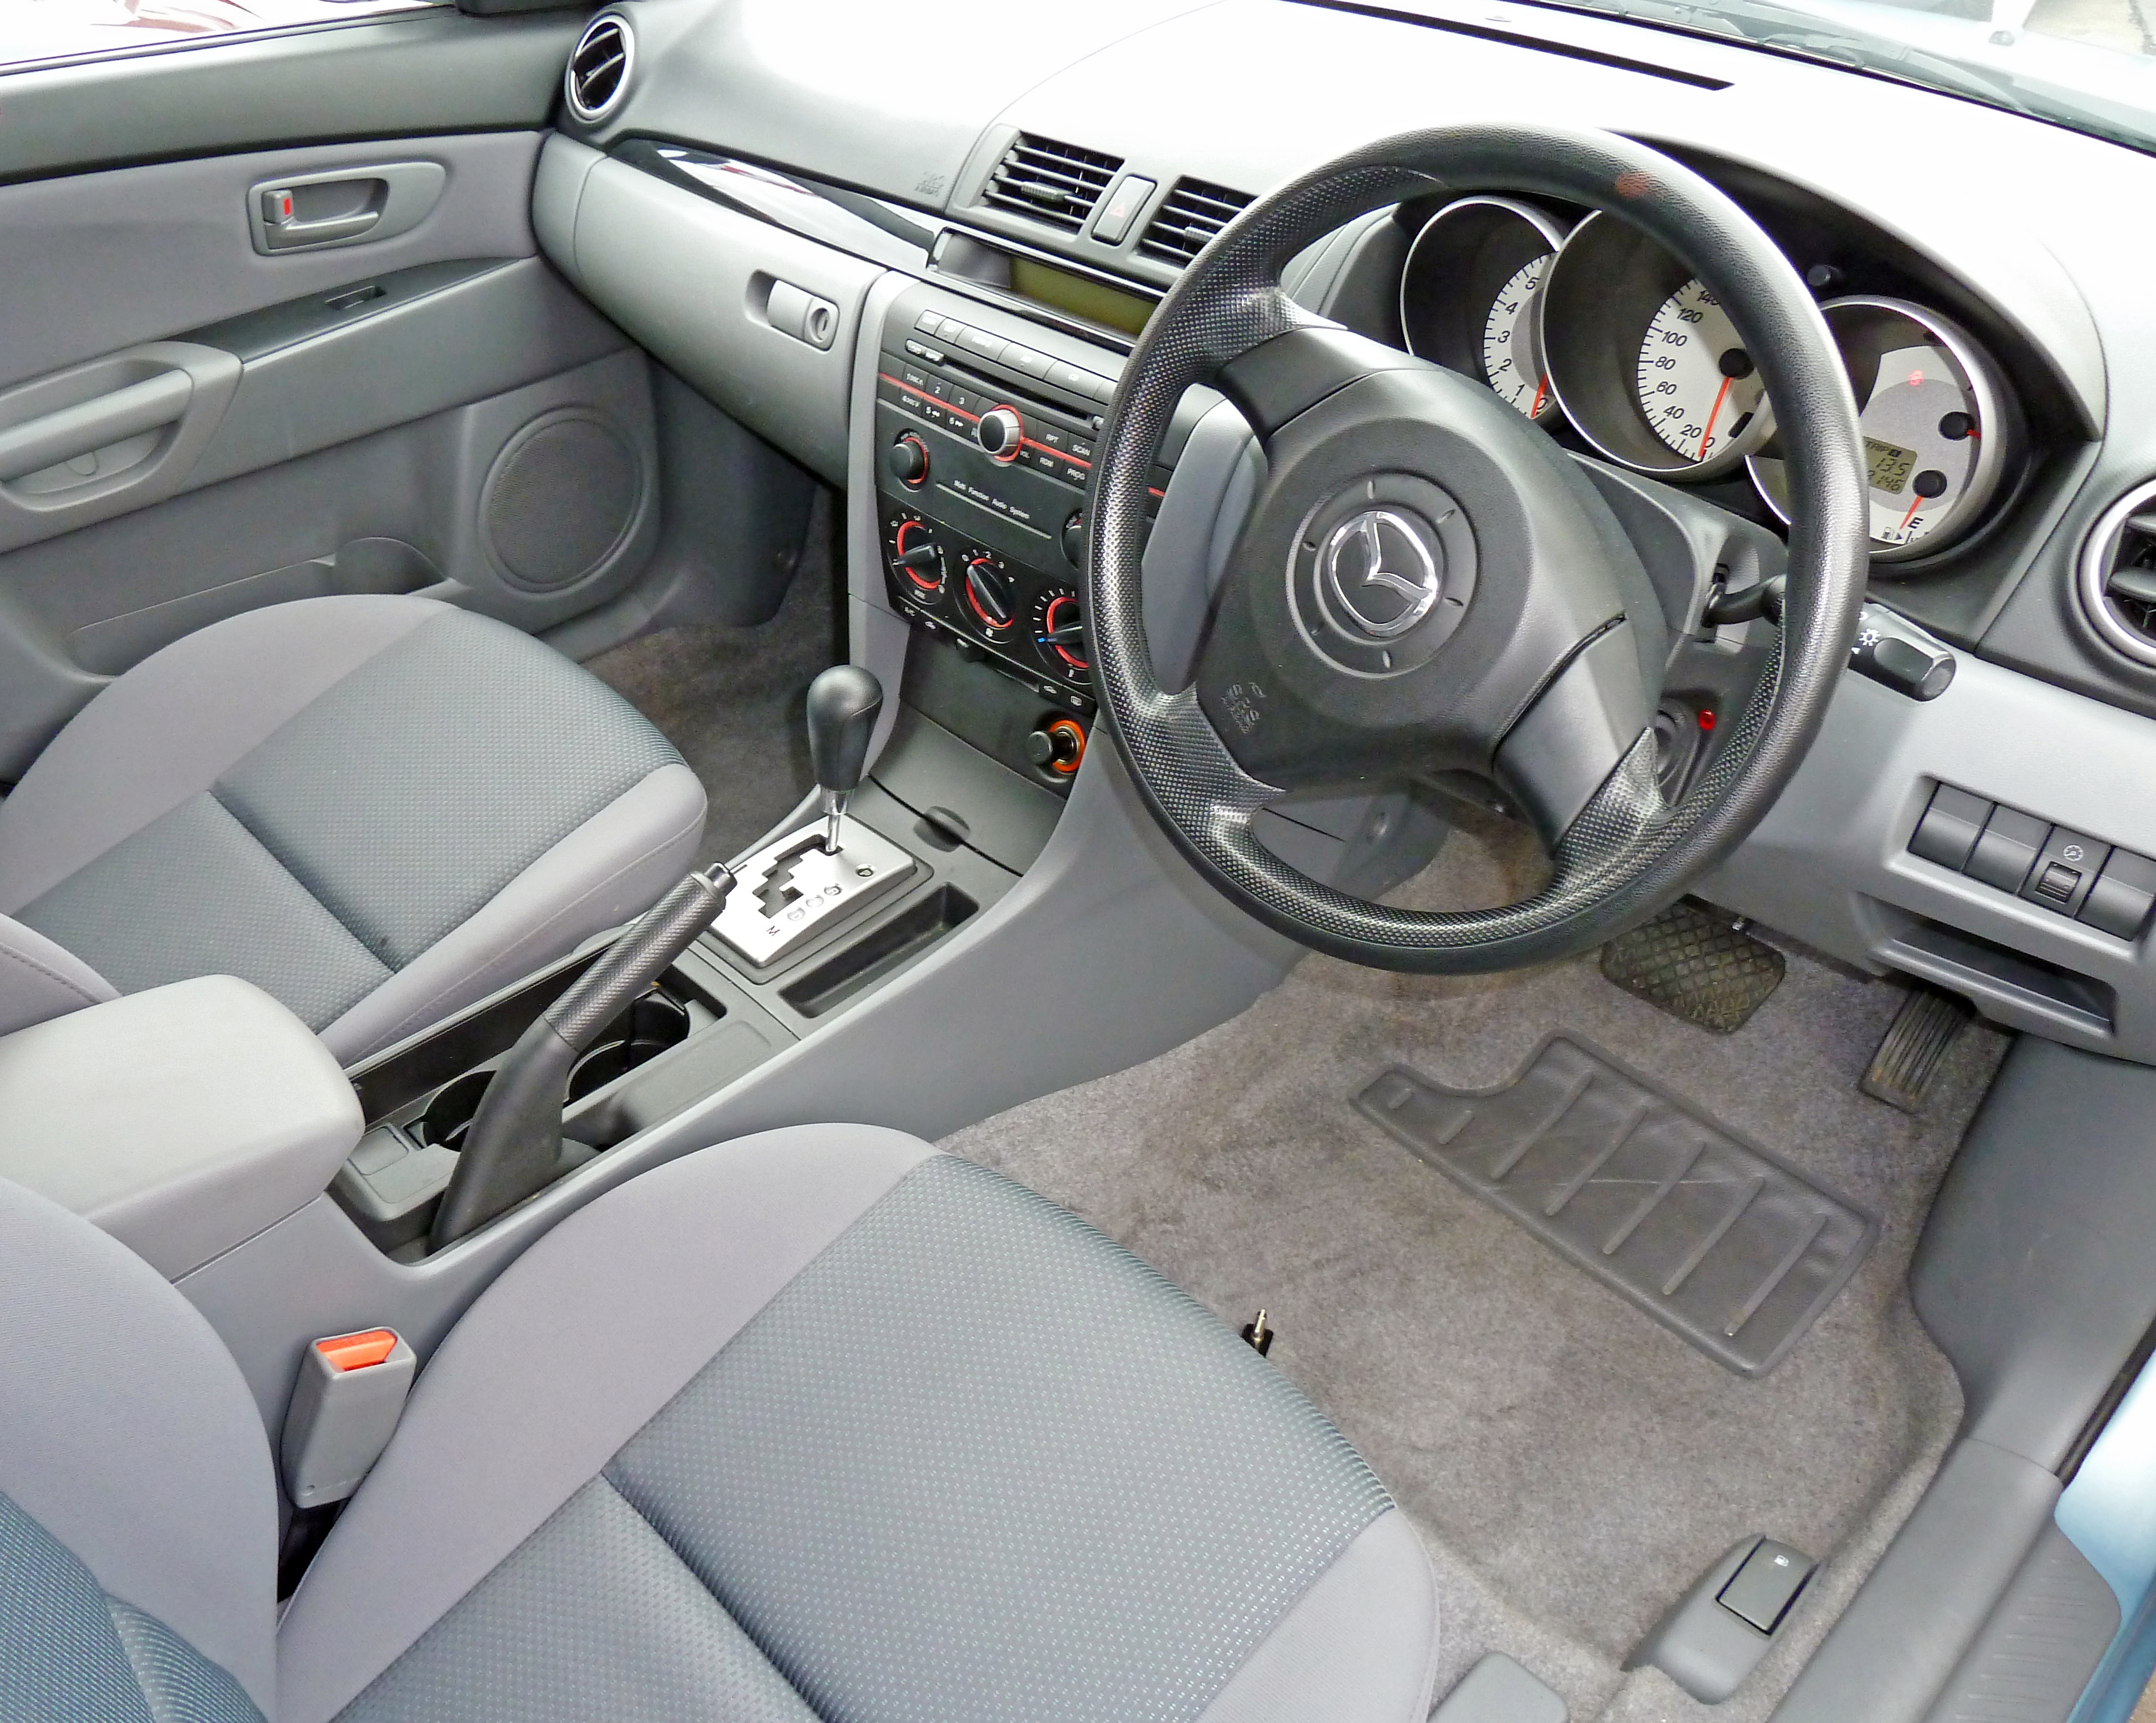 File:2007 Mazda 3 (BK Series 2) Neo hatchback 01.jpg